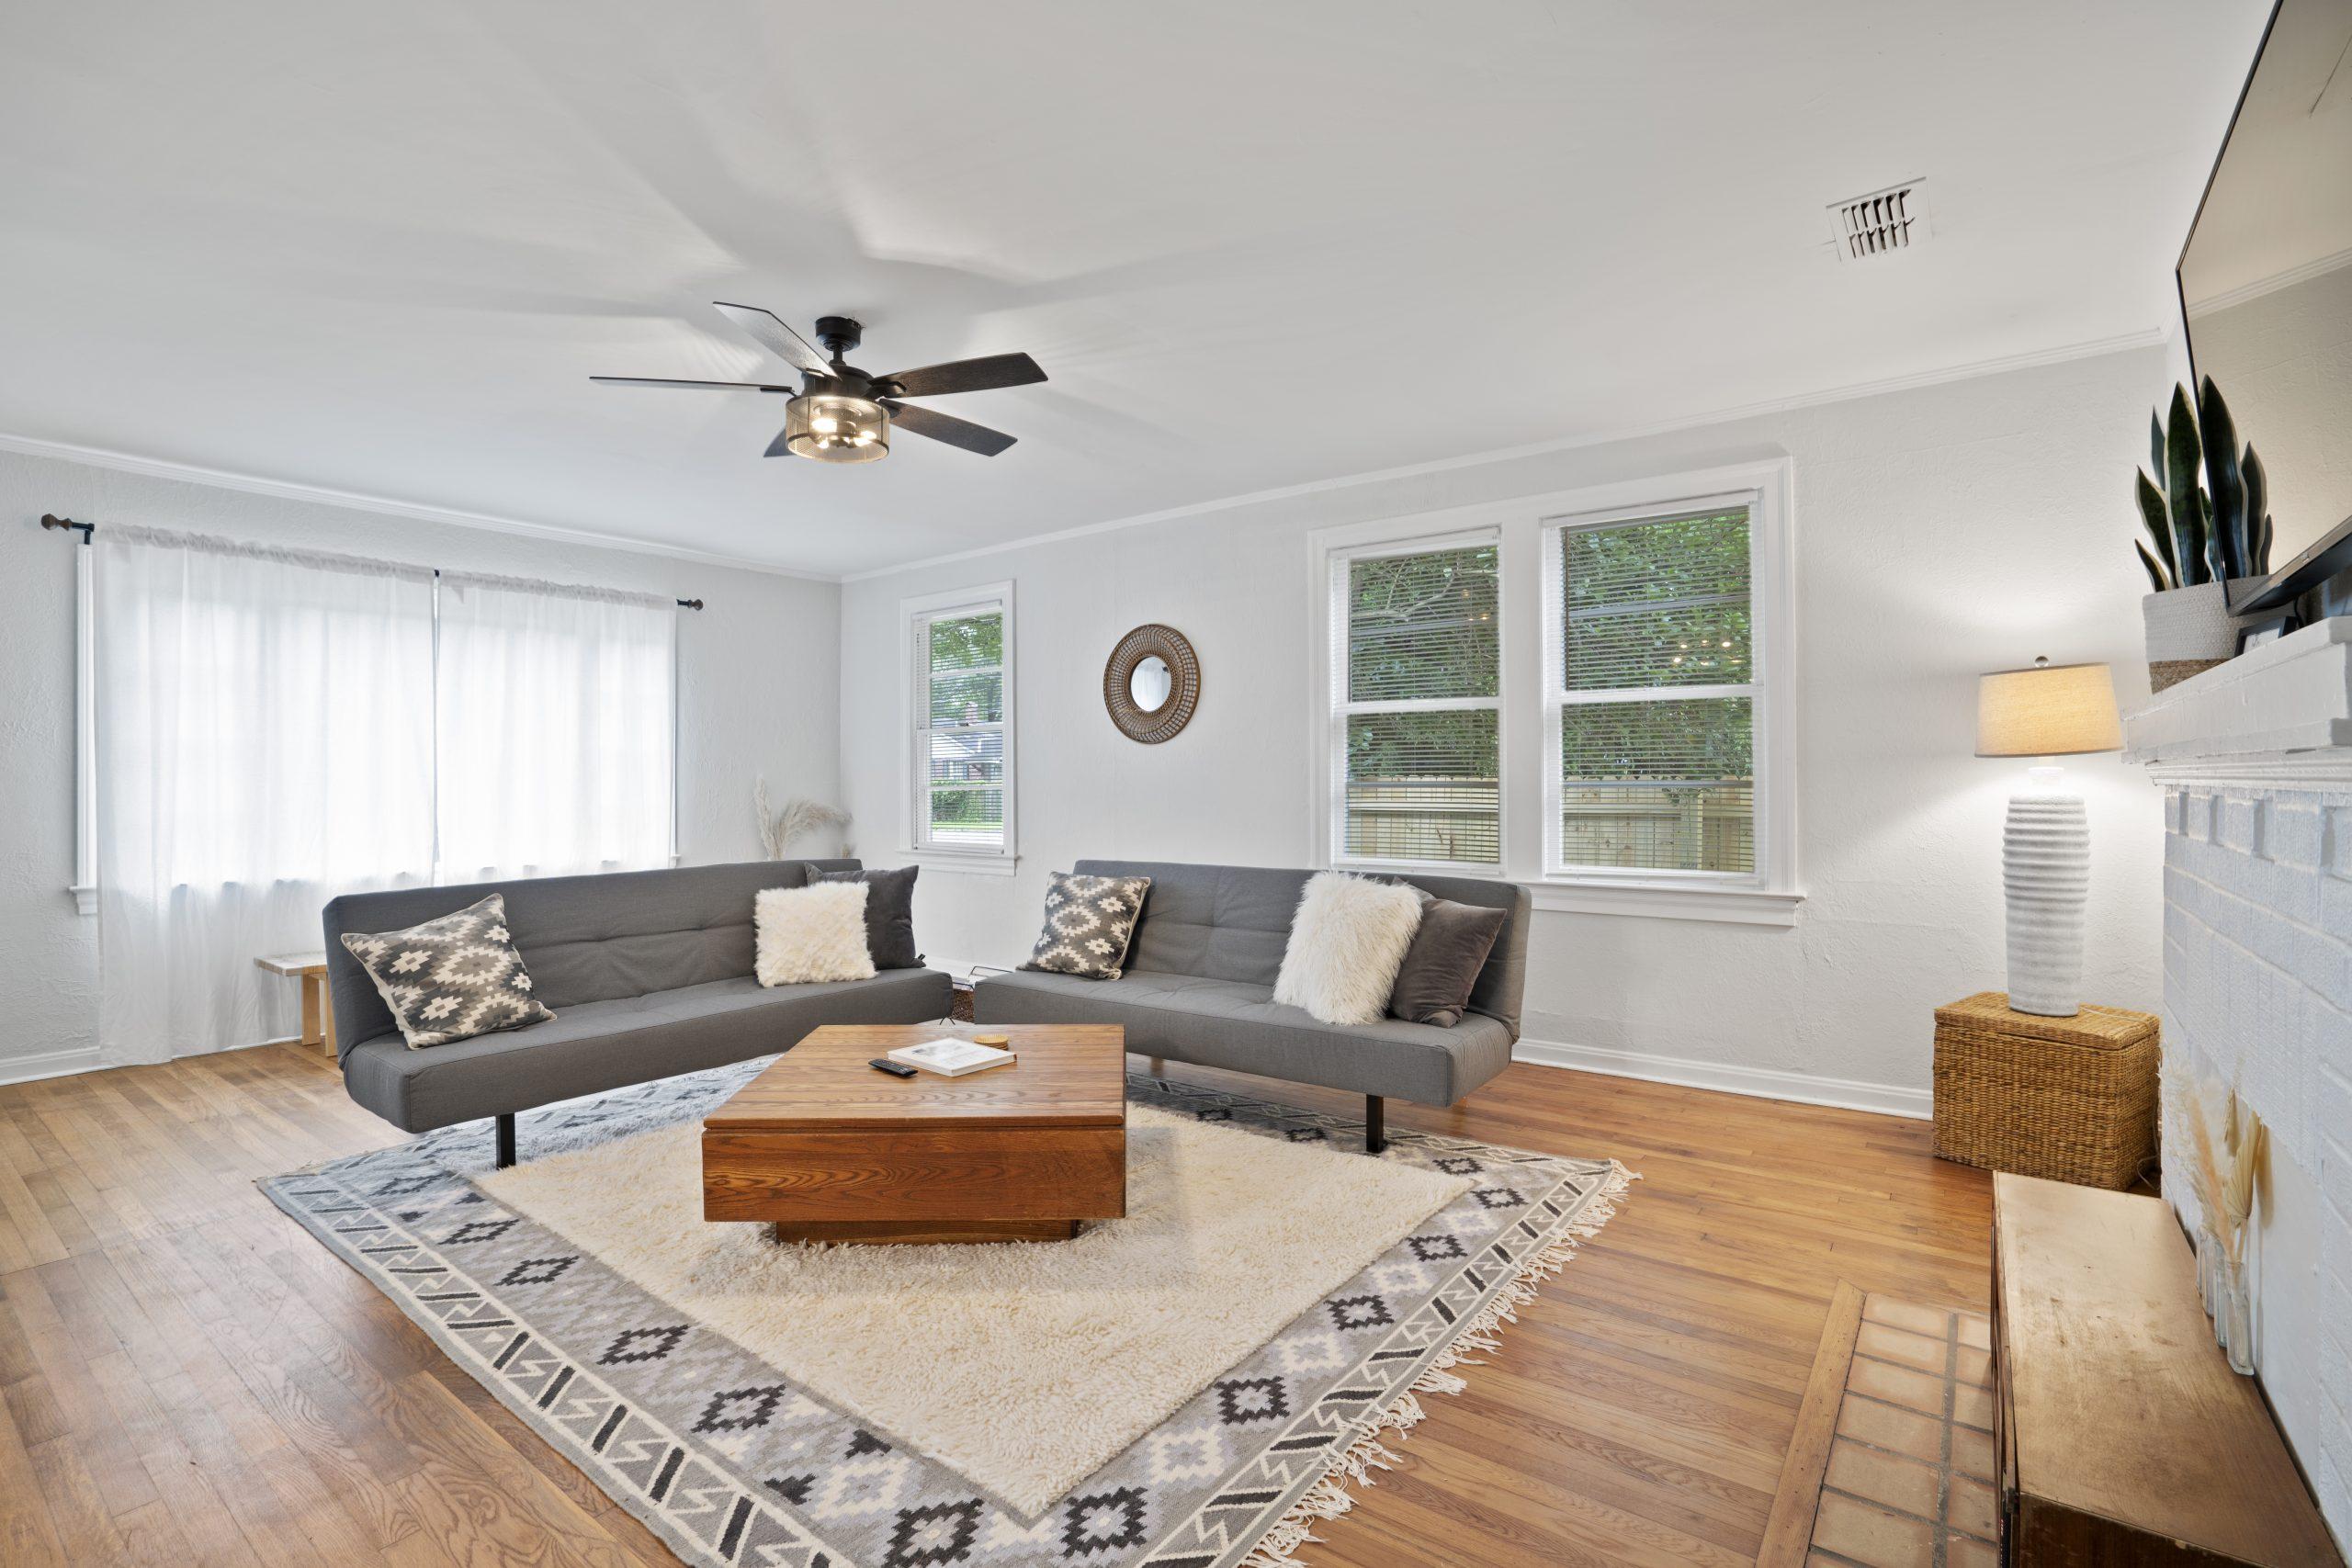 06-Living Room 4